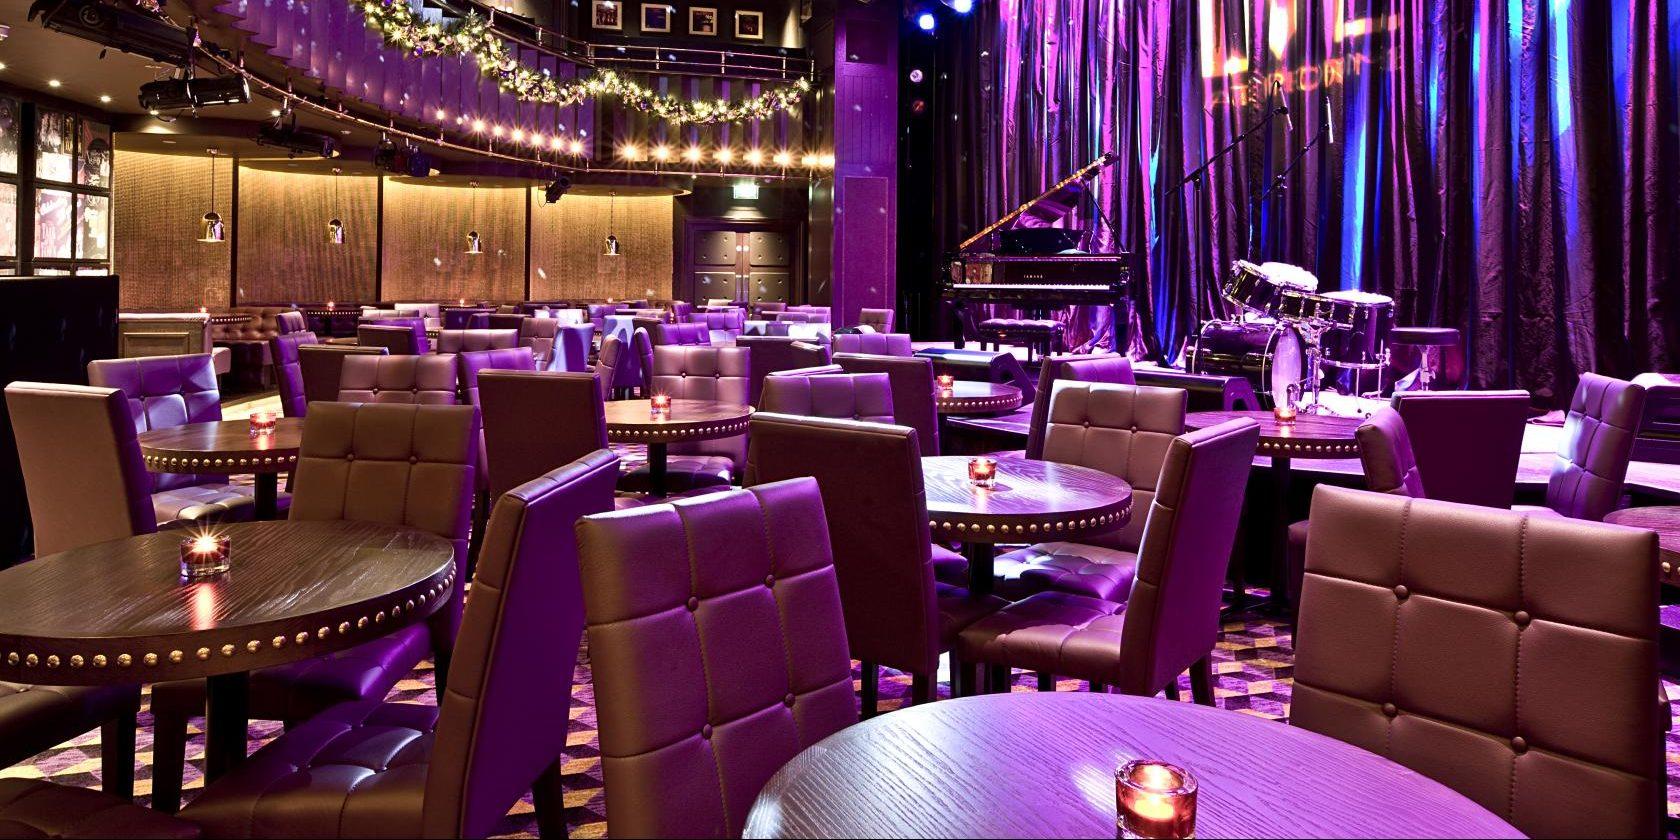 Superb Event Seating Arrangements A Quick Guide Tagvenue Com Download Free Architecture Designs Intelgarnamadebymaigaardcom